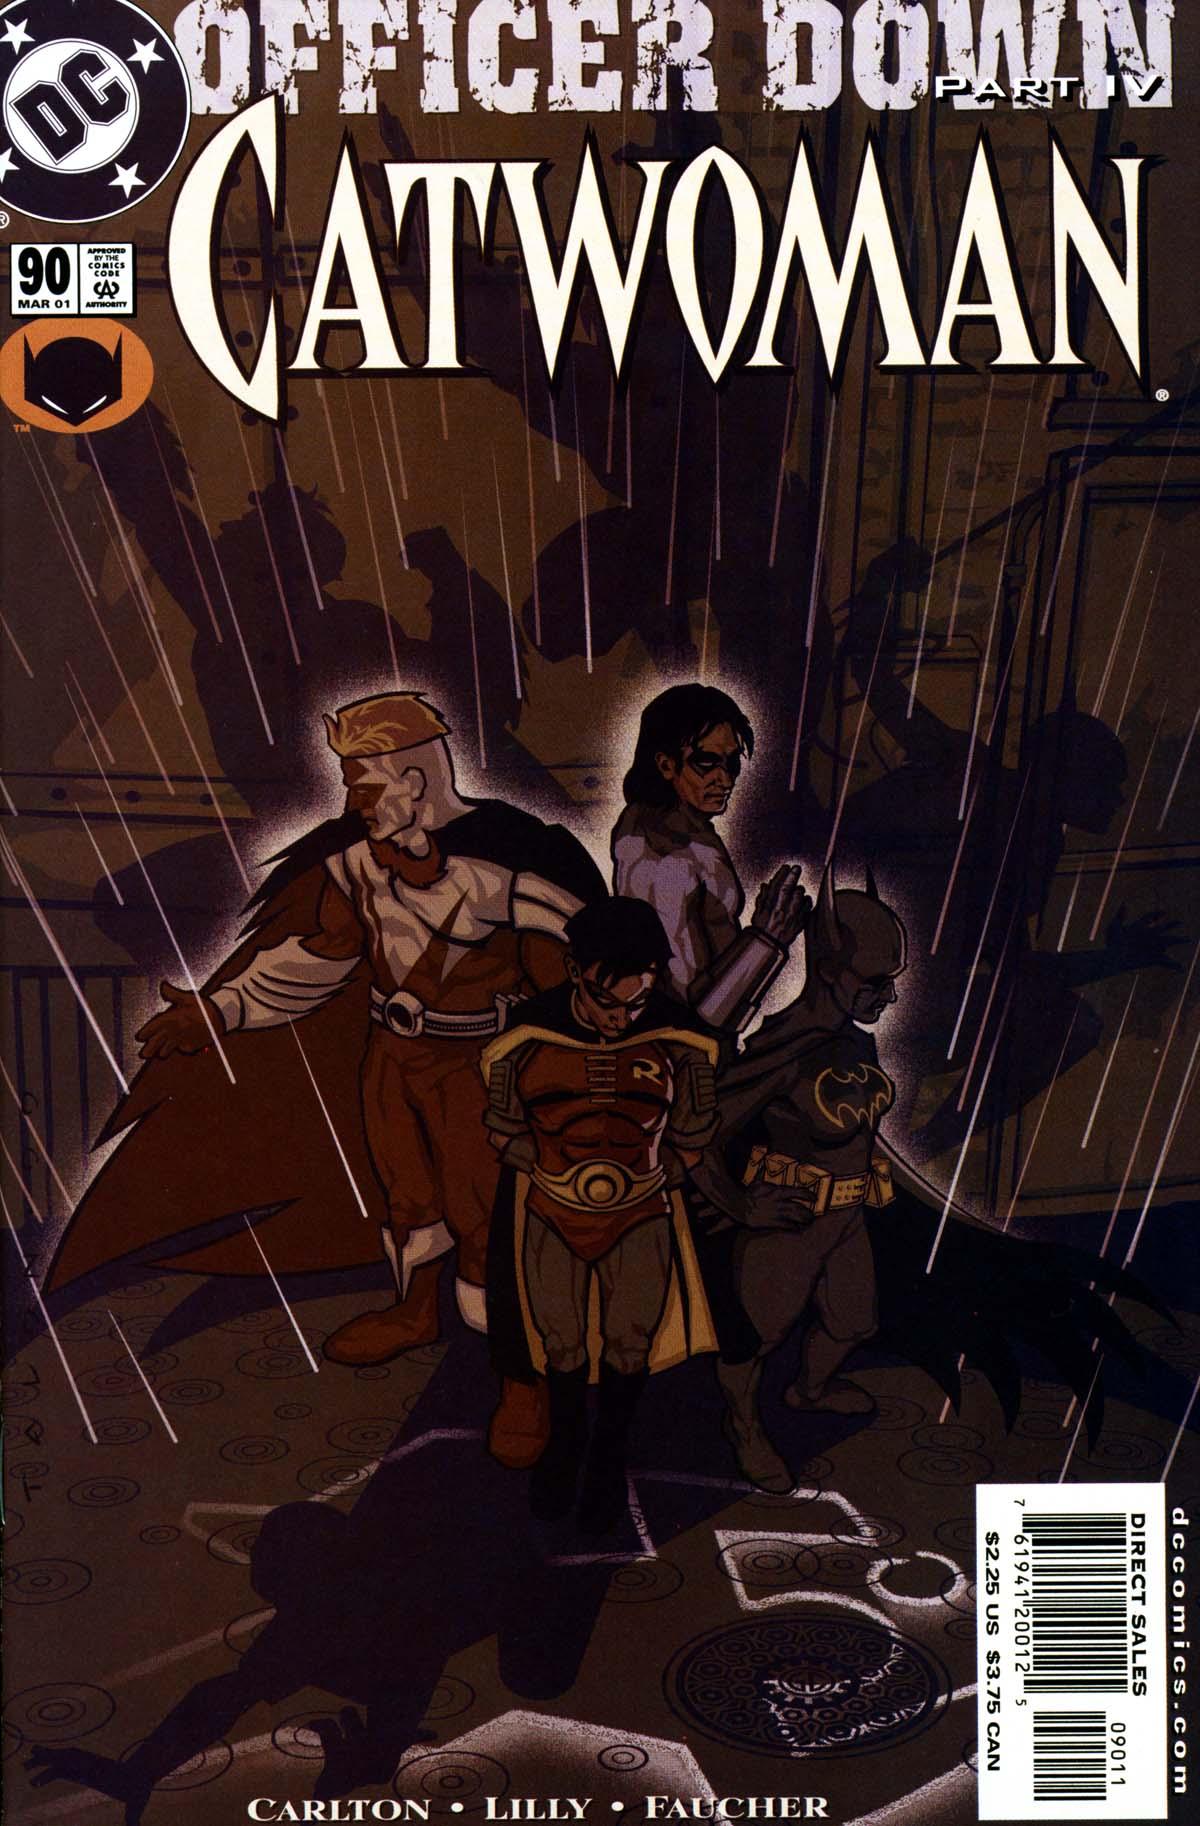 Catwoman 90 pg00.jpg